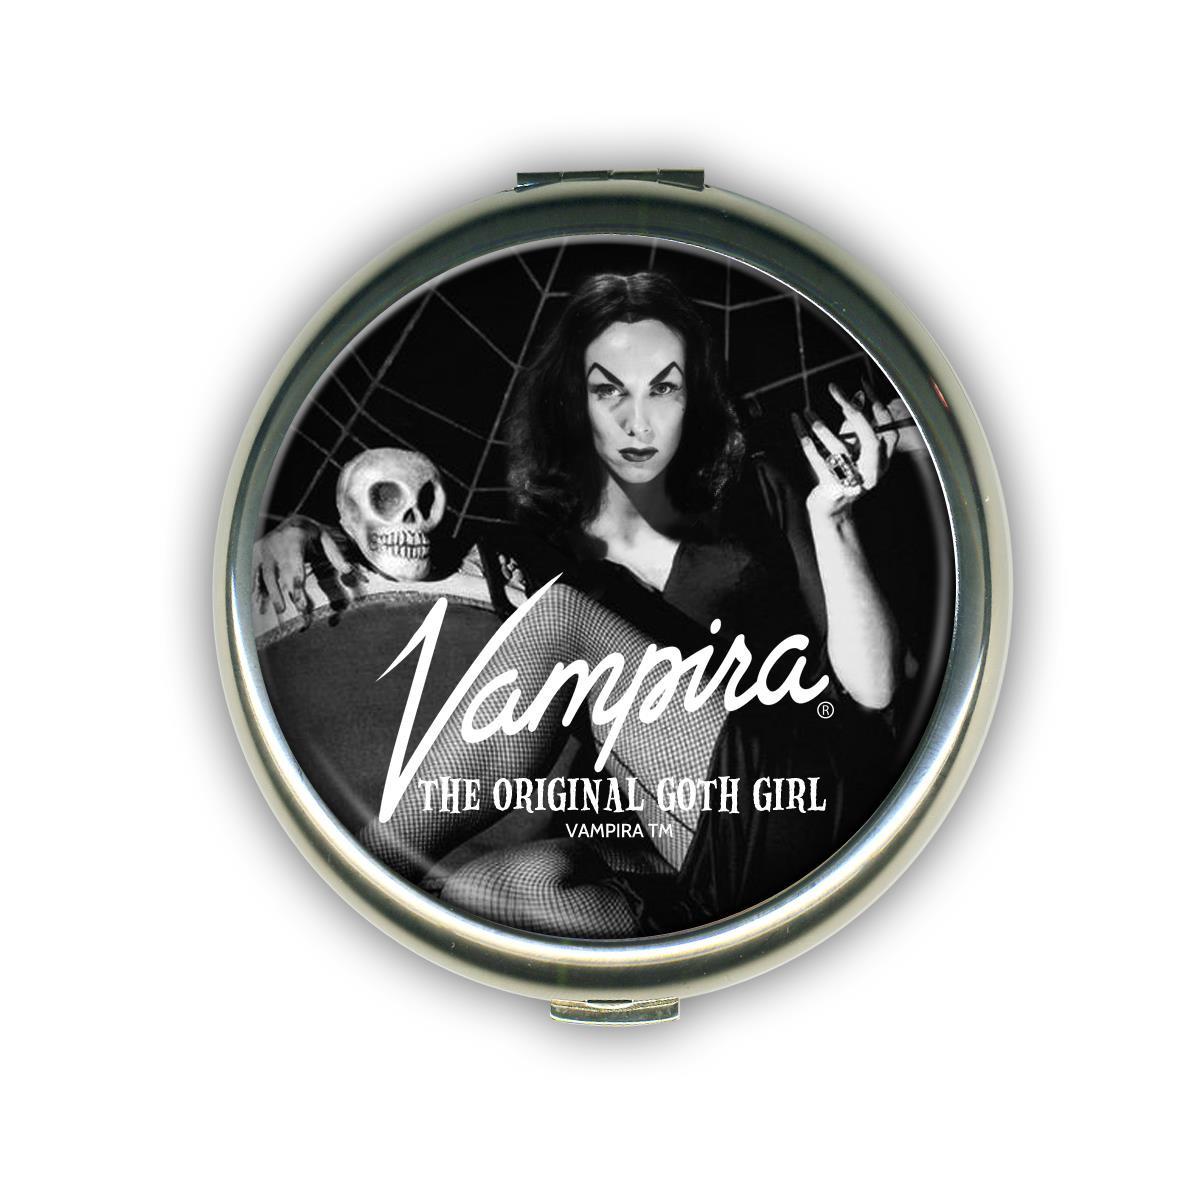 Vampira Goth Girl Compact Mirror* -